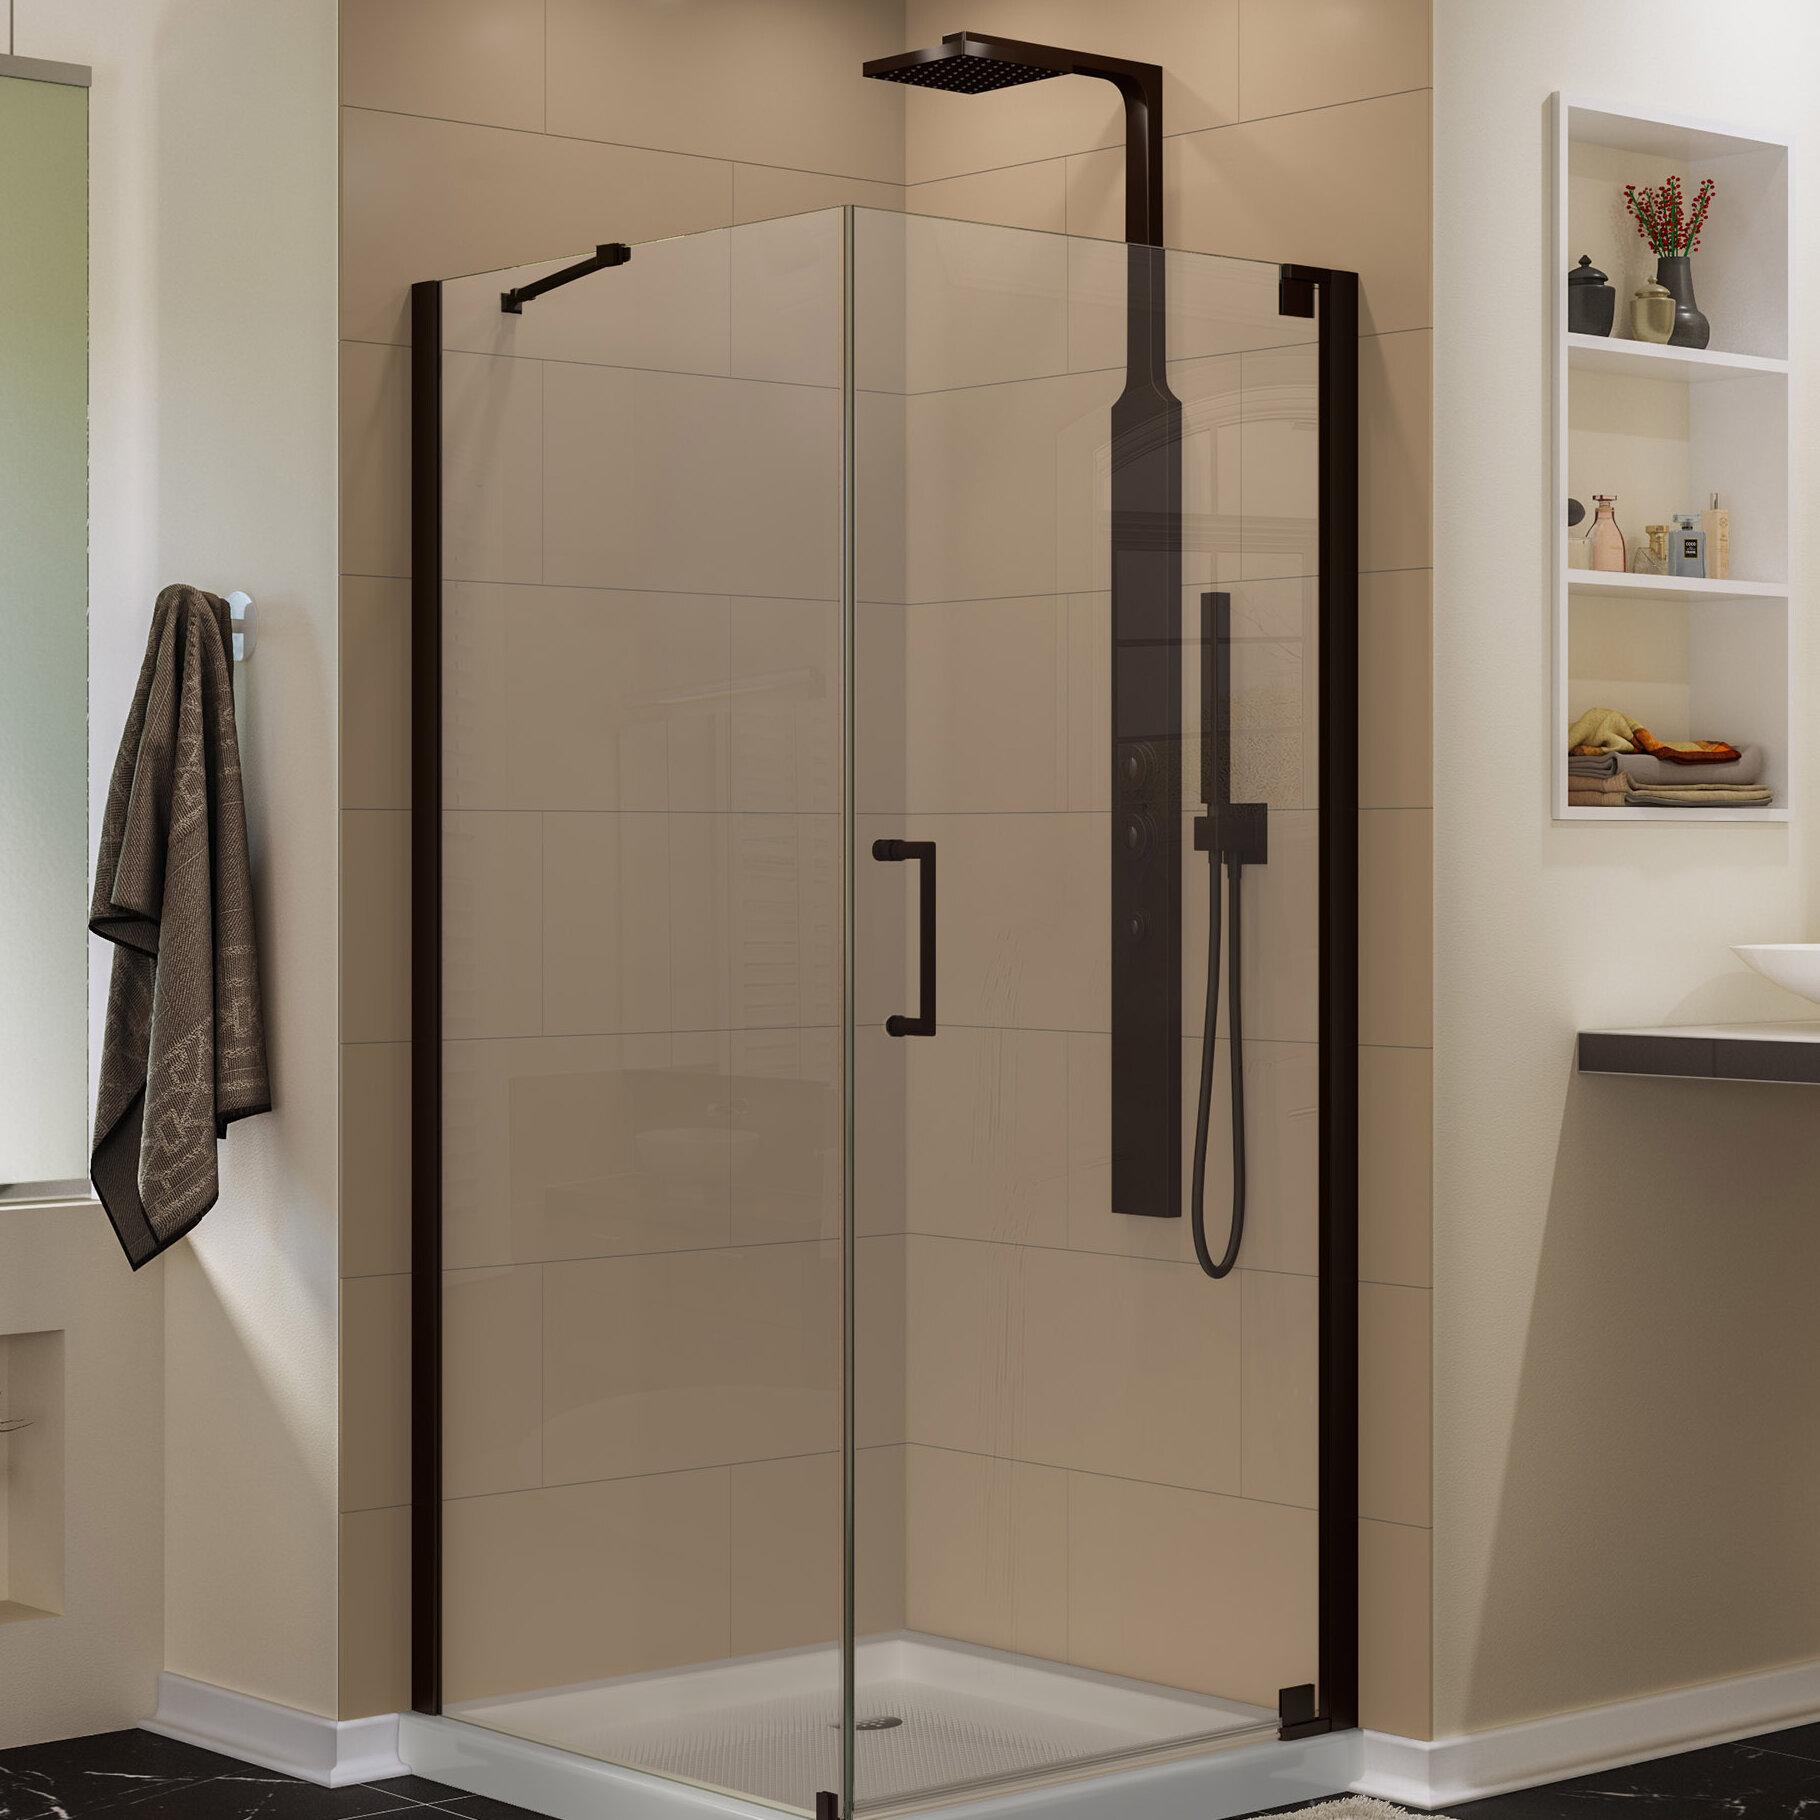 Dreamline Elegance 32 X 72 Pivot Frameless Shower Door With Clear